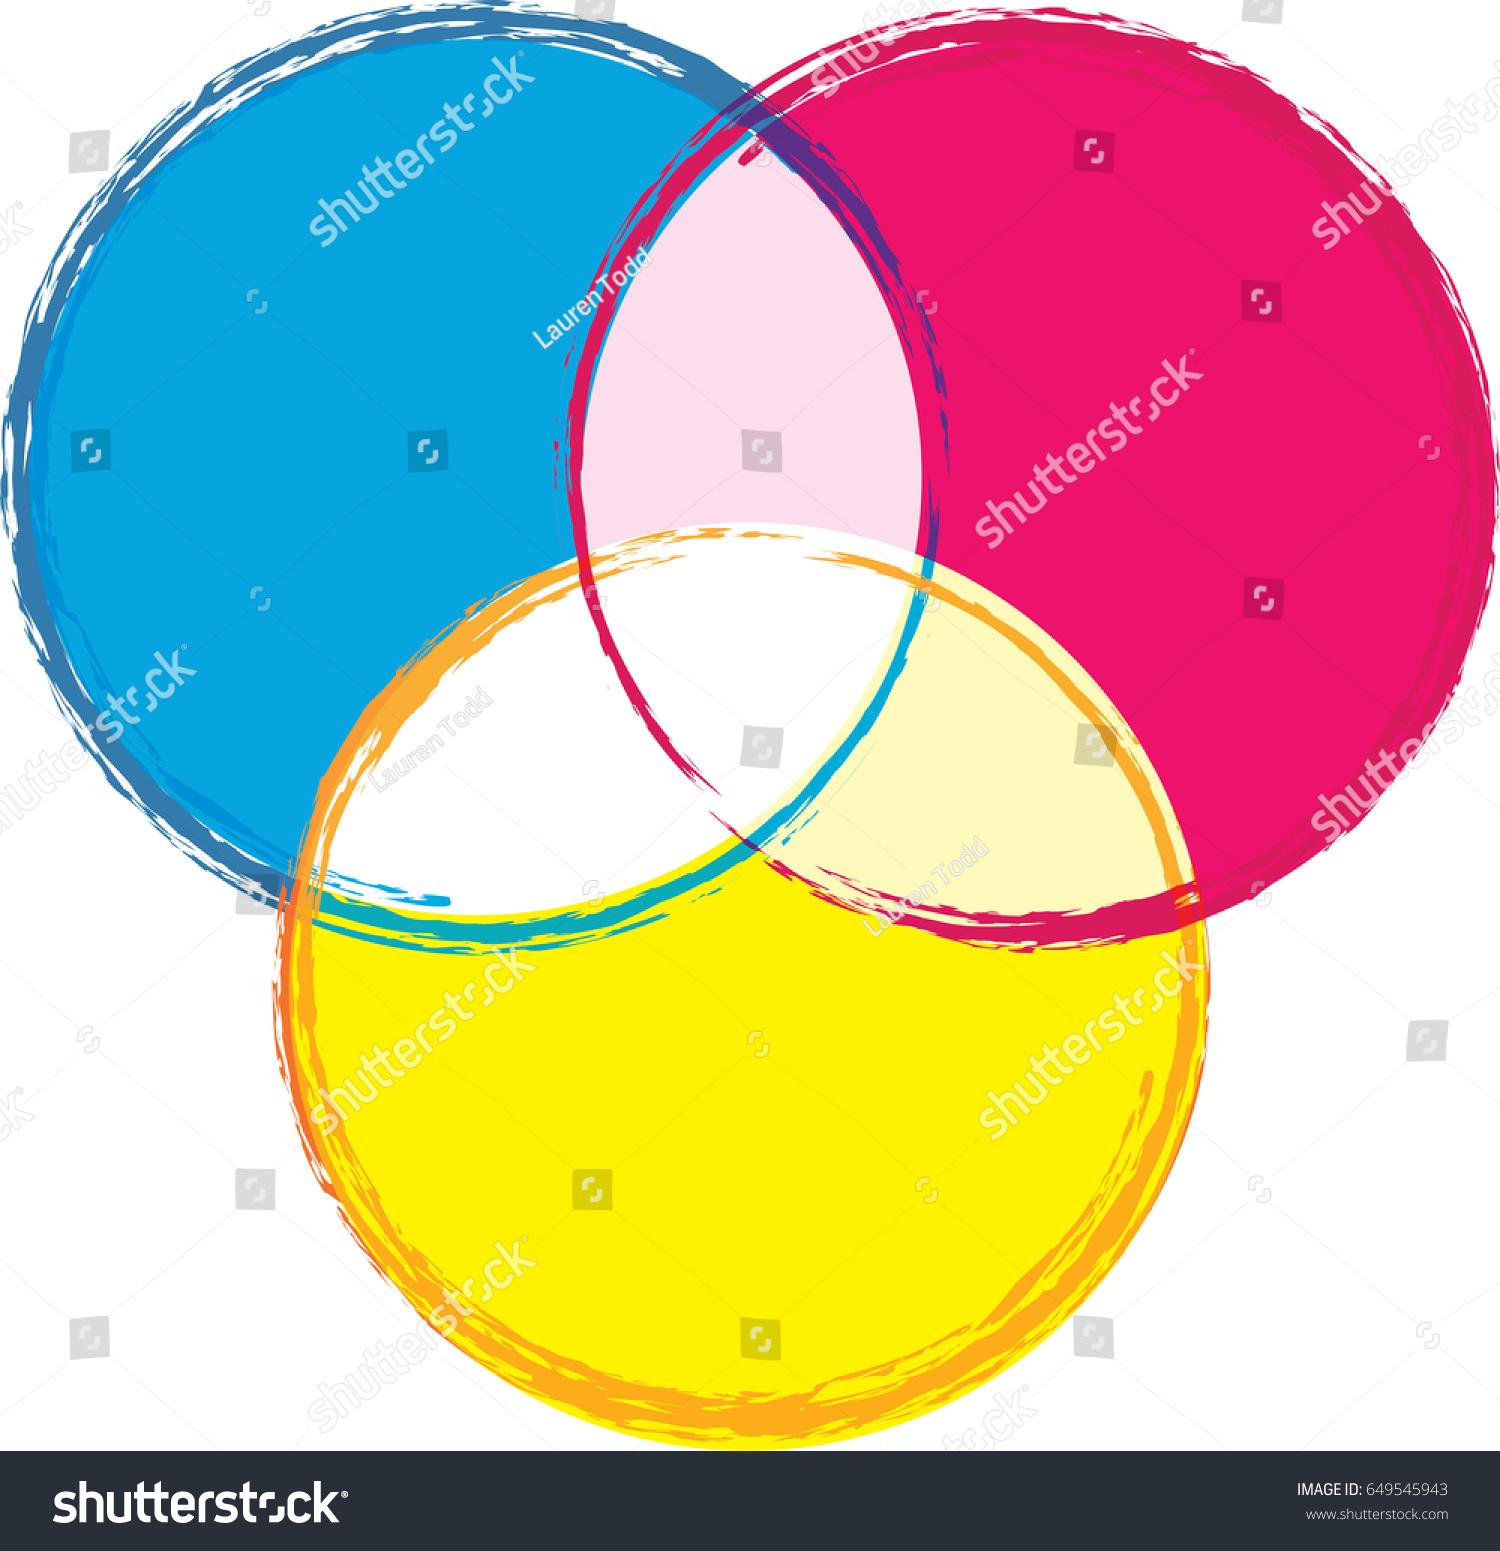 Venn diagram bright primary colors stock vector 649545943 venn diagram in bright primary colors pooptronica Choice Image